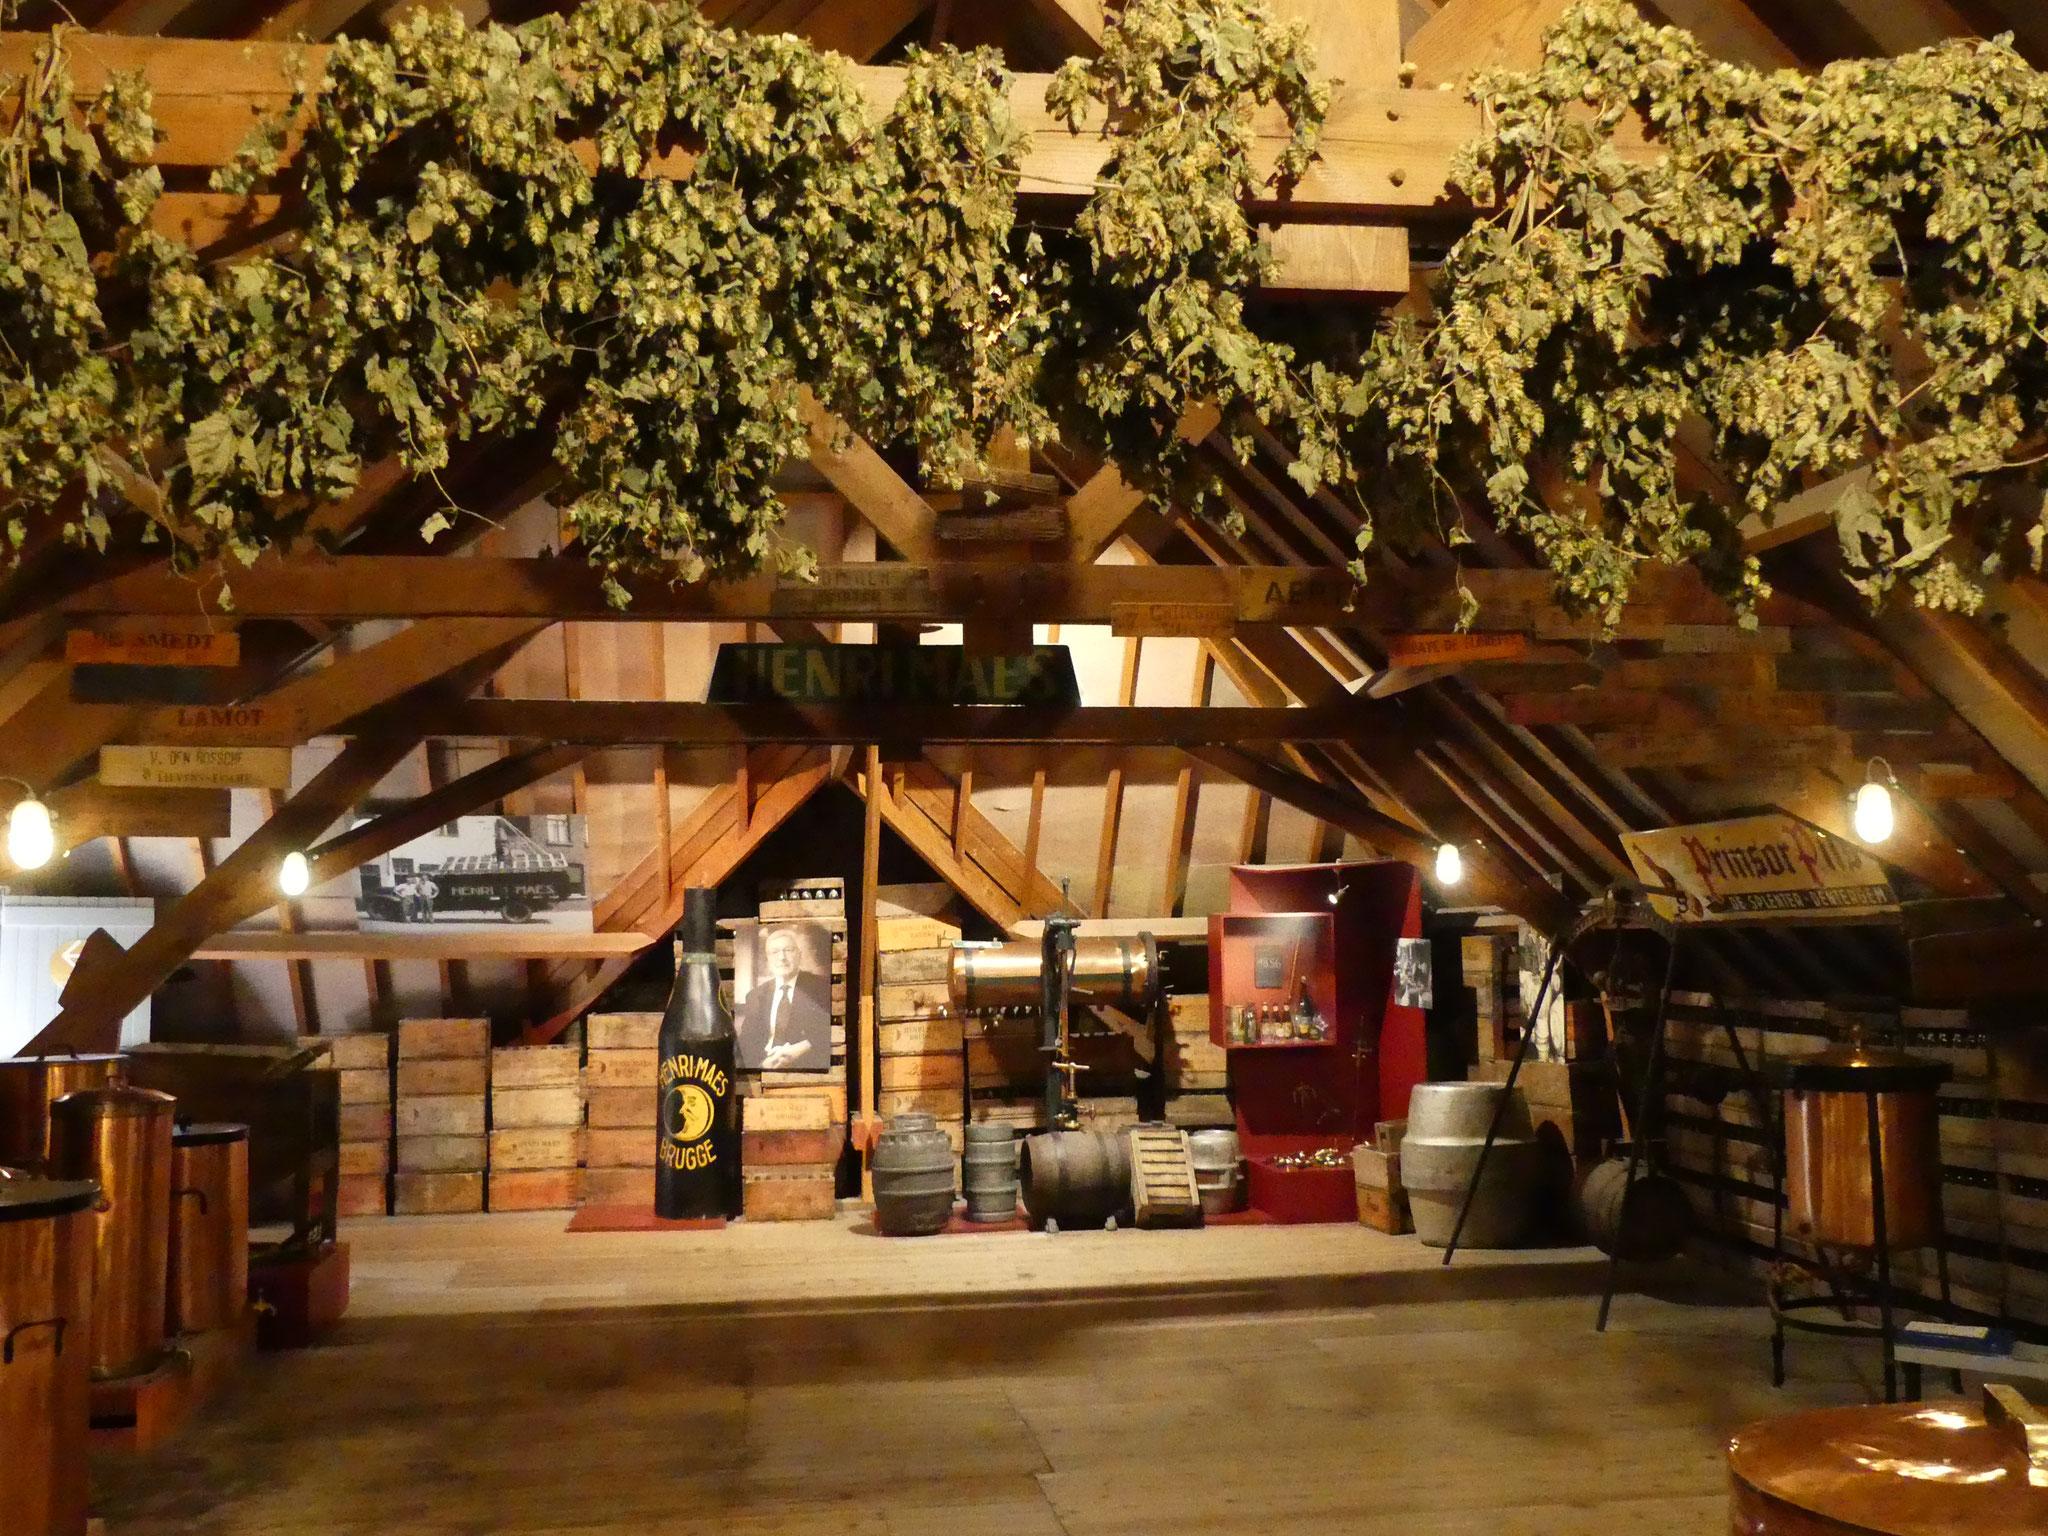 Visite d'une brasserie à Bruges